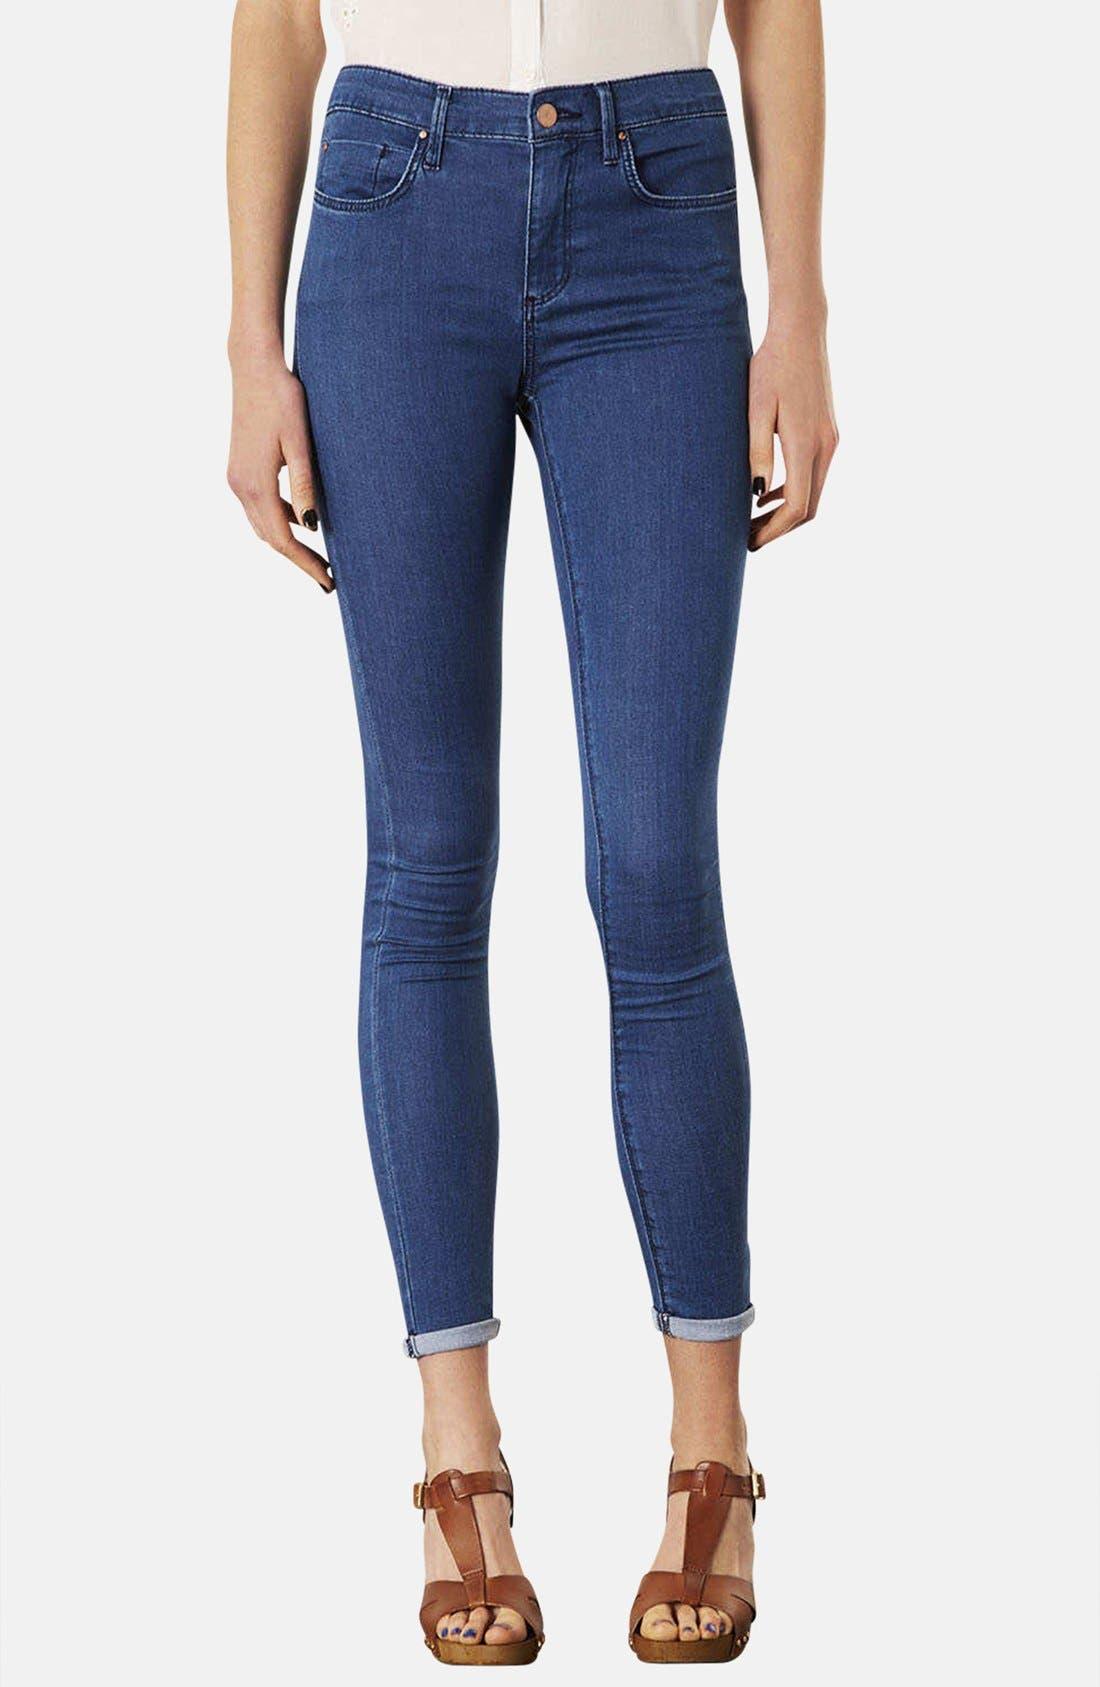 Main Image - Topshop Moto 'Leigh' Skinny Jeans (Blue) (Regular & Short)